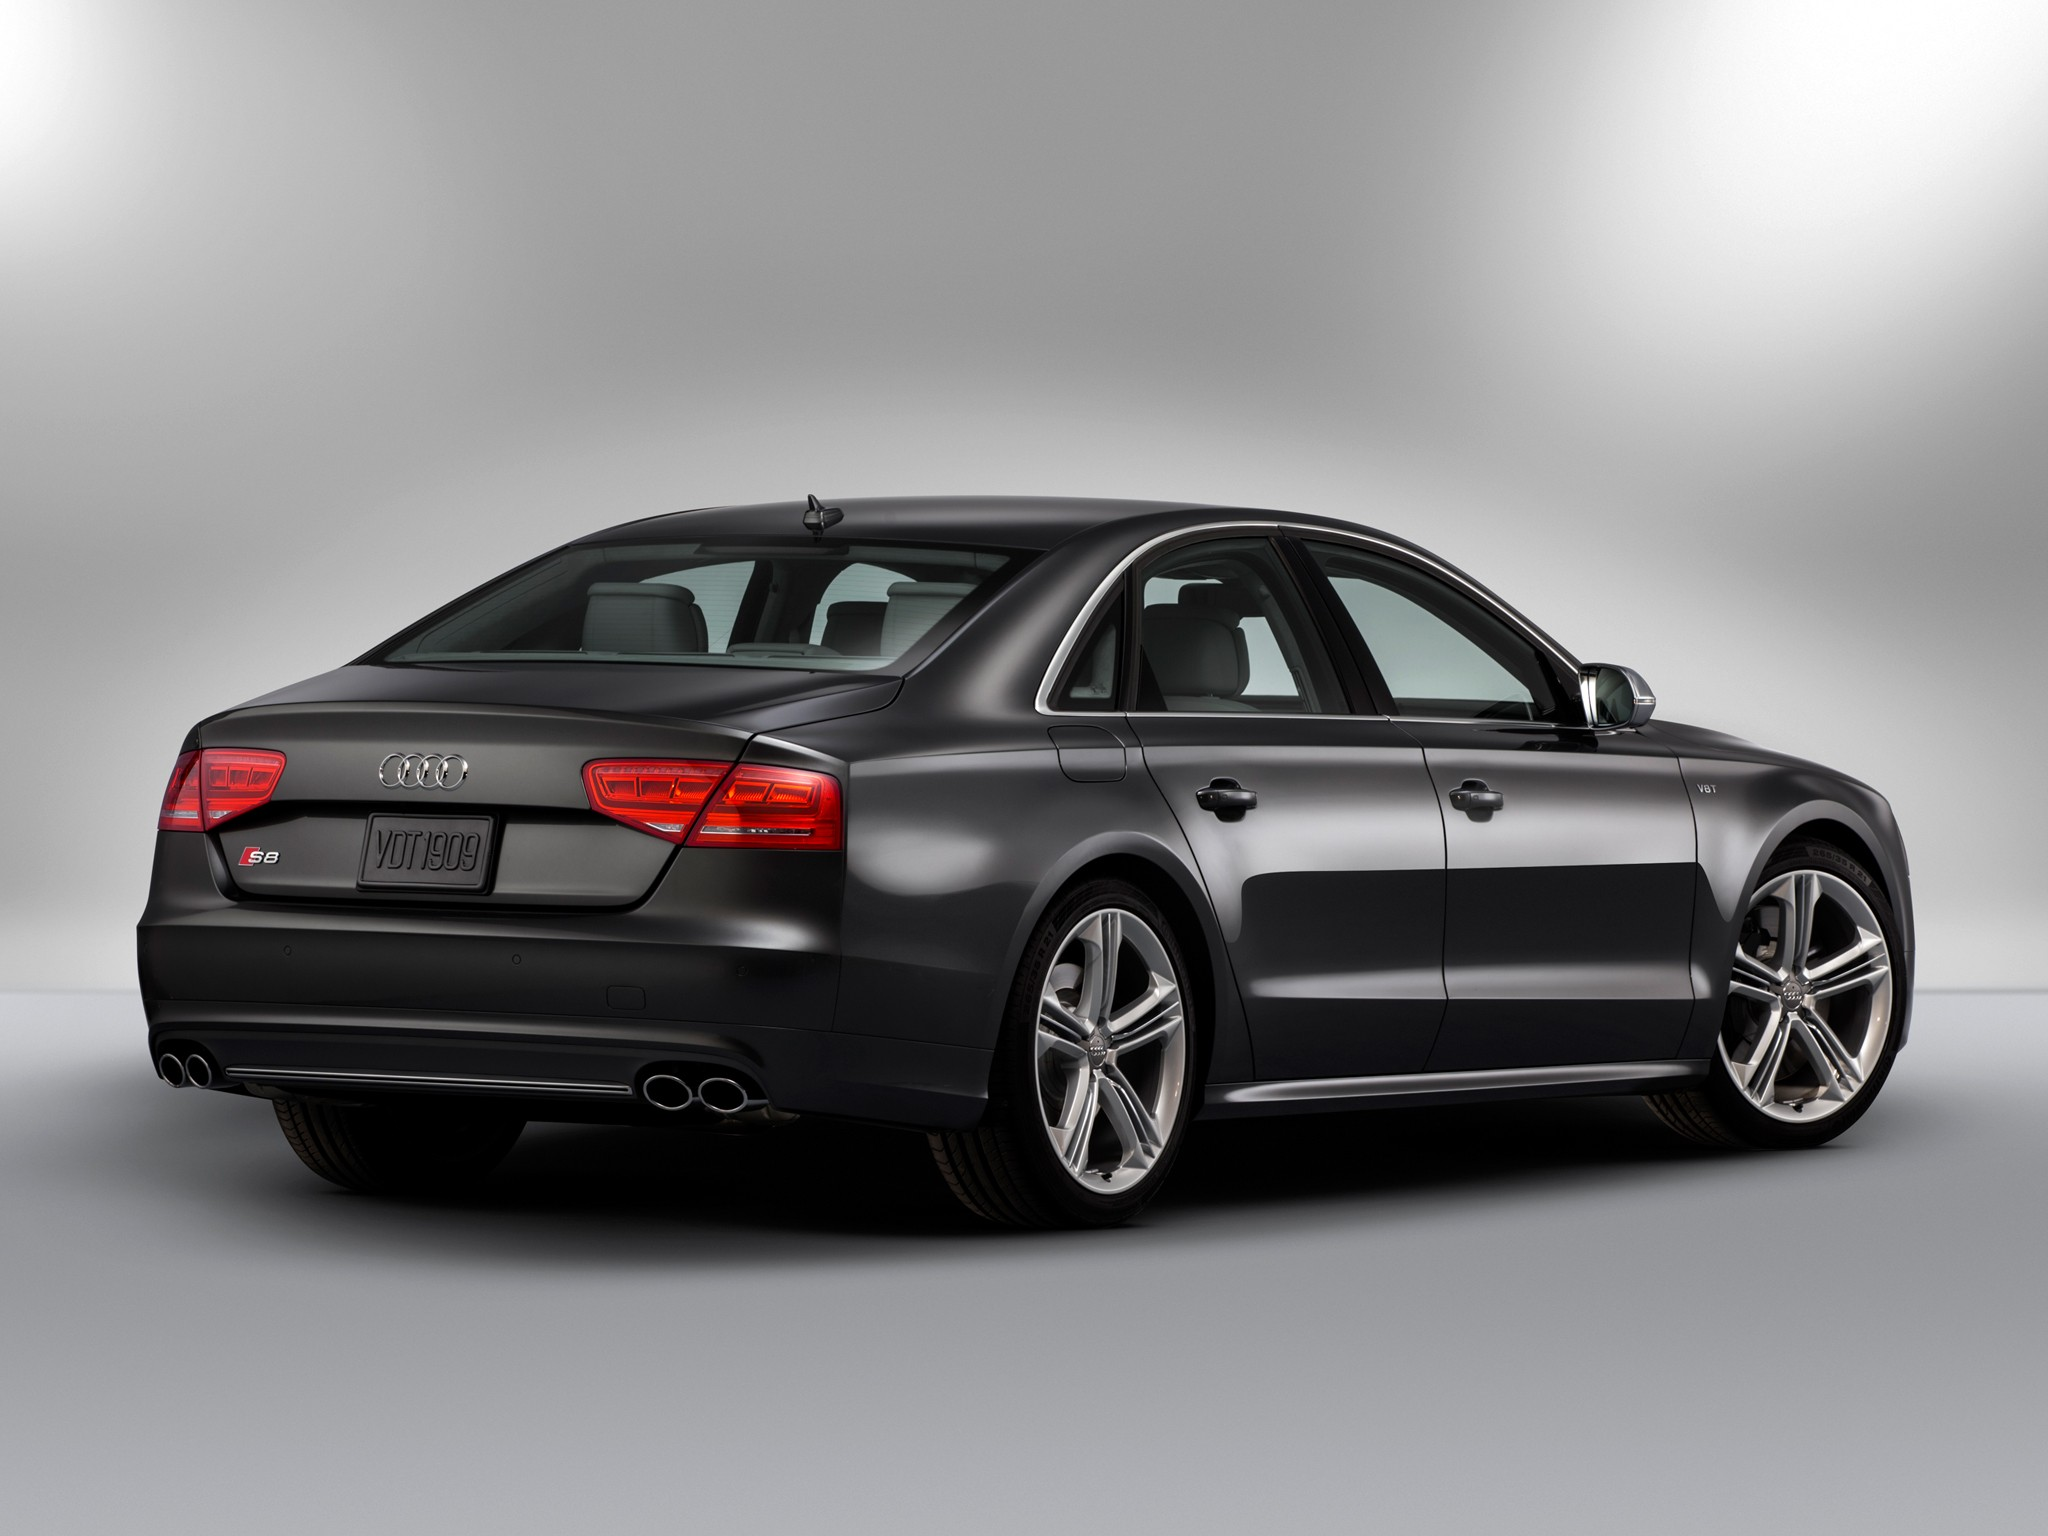 Audi S8 W12 Turbo >> AUDI S8 (D4) - 2012, 2013 - autoevolution